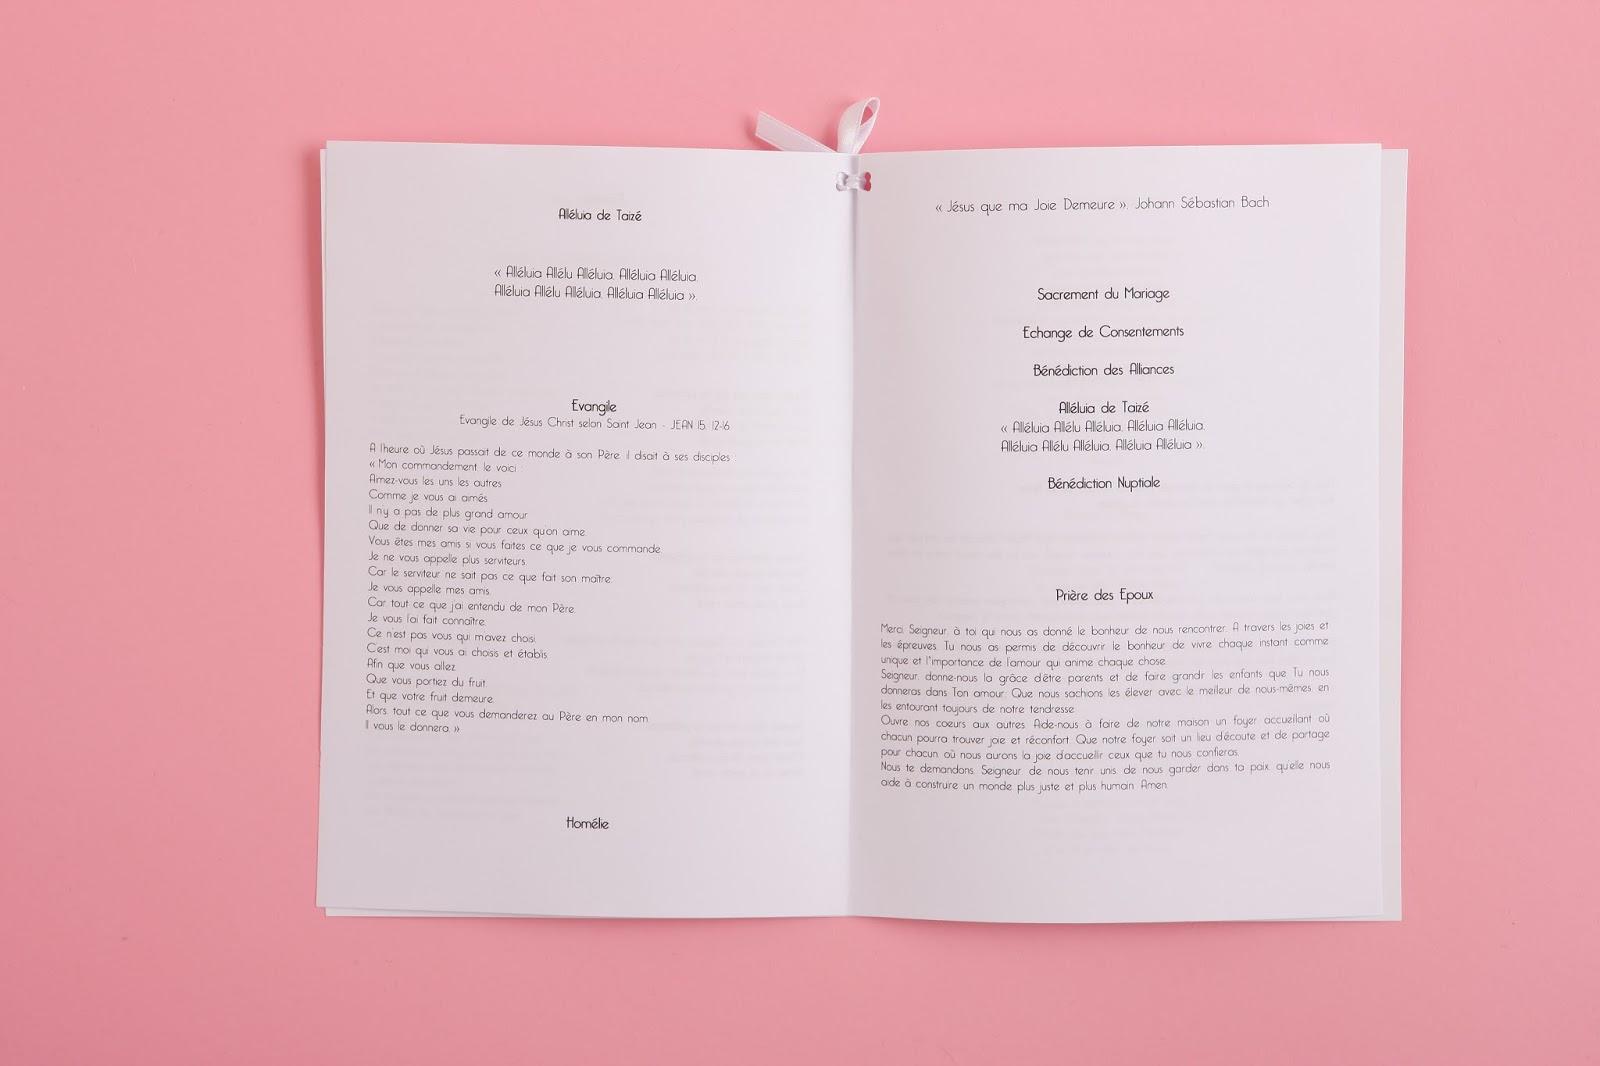 livret de messe mariage diy maison hope - Exemple De Livret De Messe Mariage